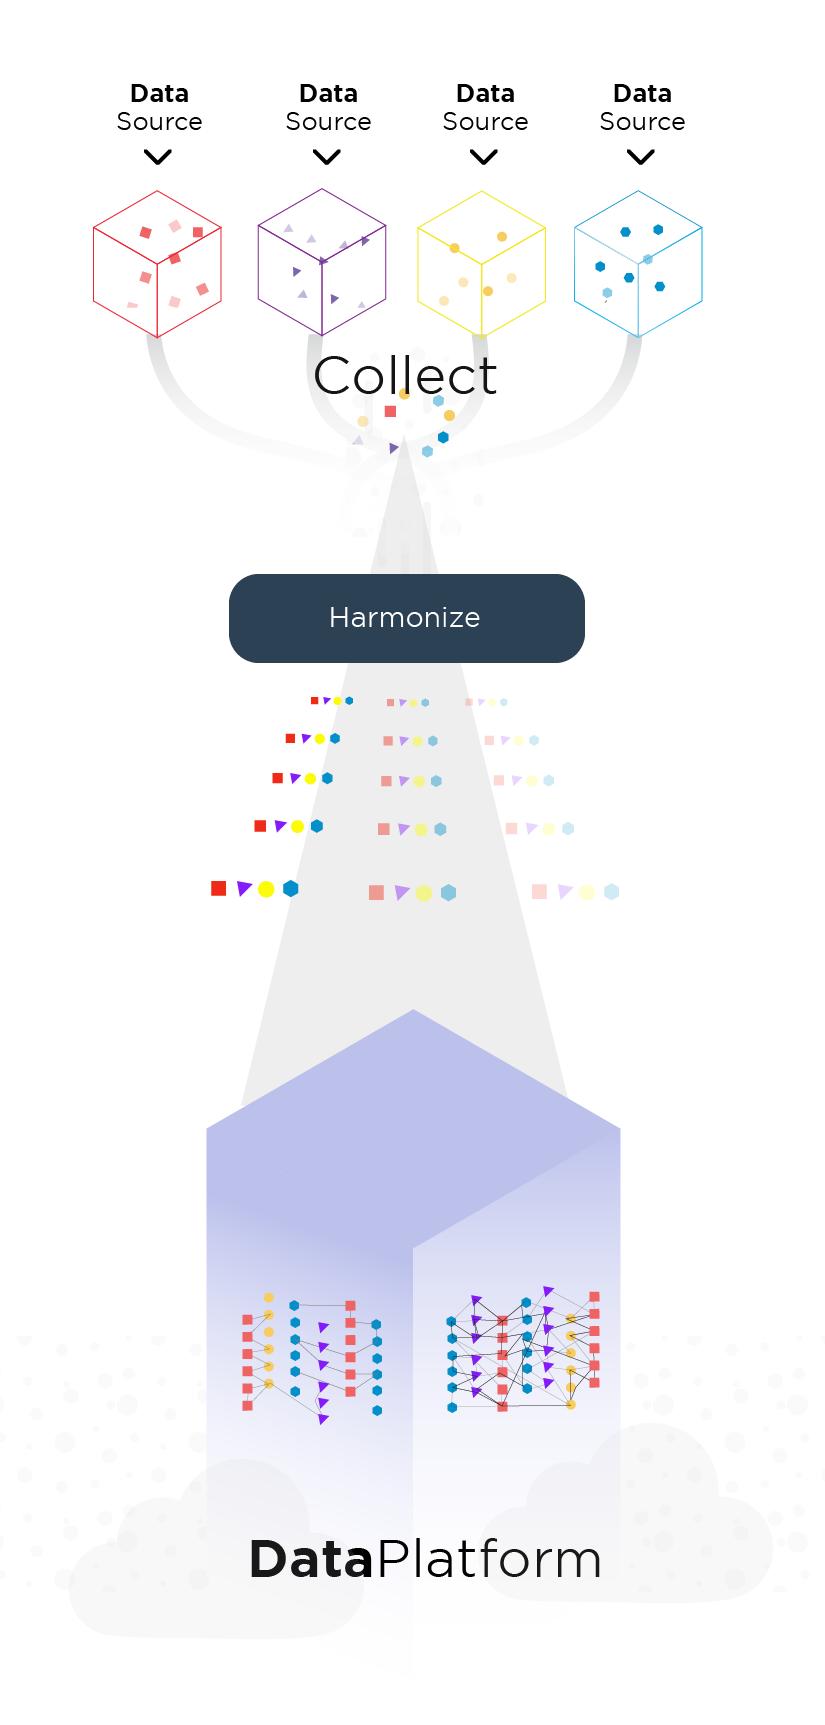 03 - Hotel Data Platform - Harmonized and Cleansed data - SnapShot